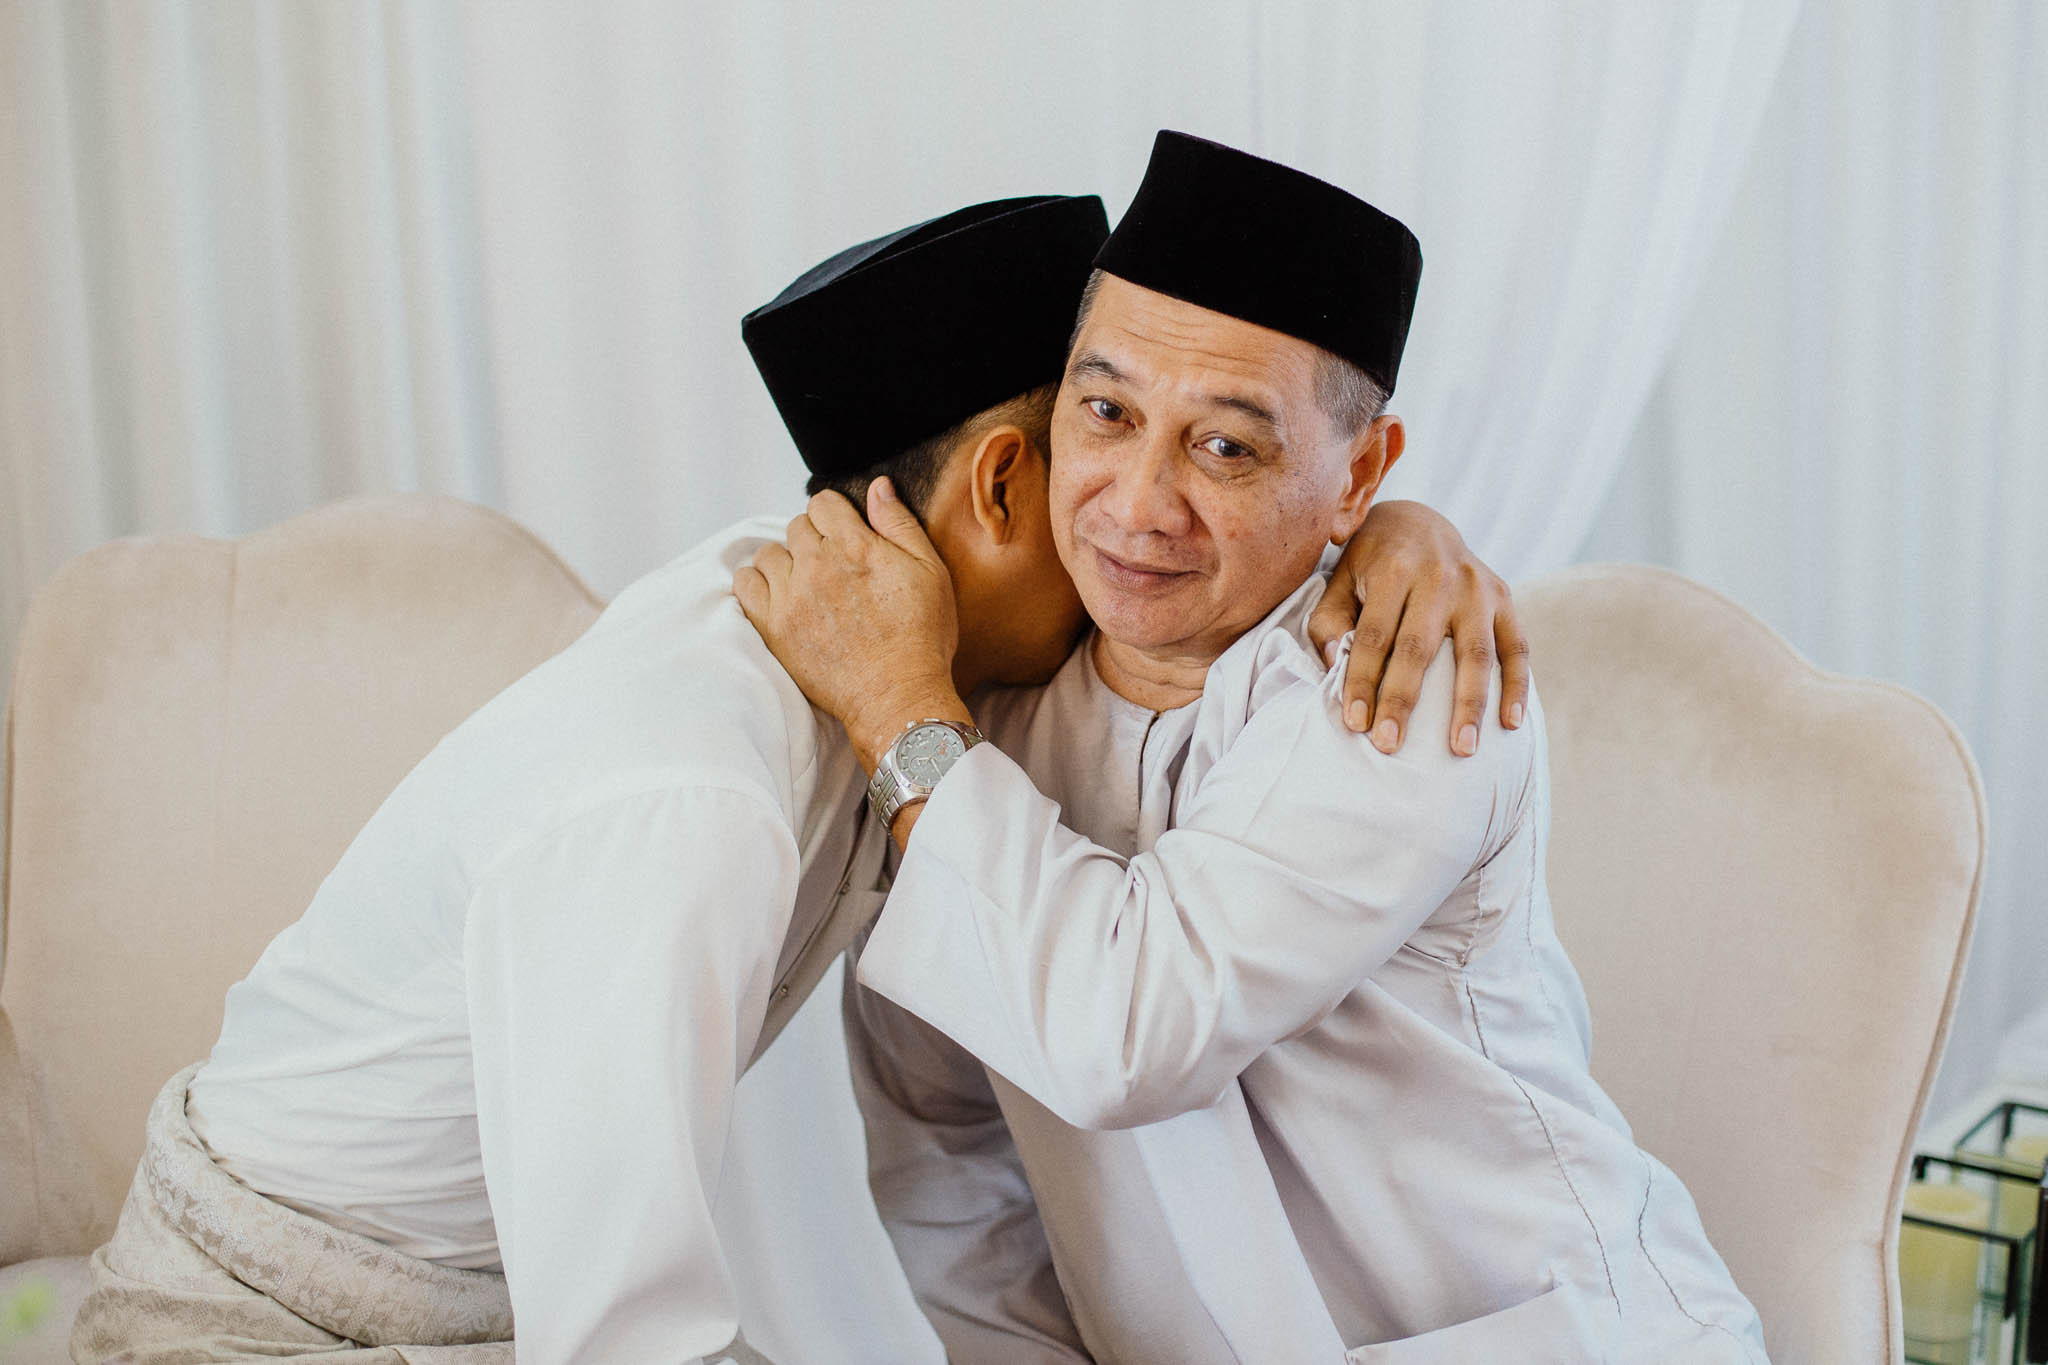 singapore-wedding-photographer-addafiq-nufail-023.jpg